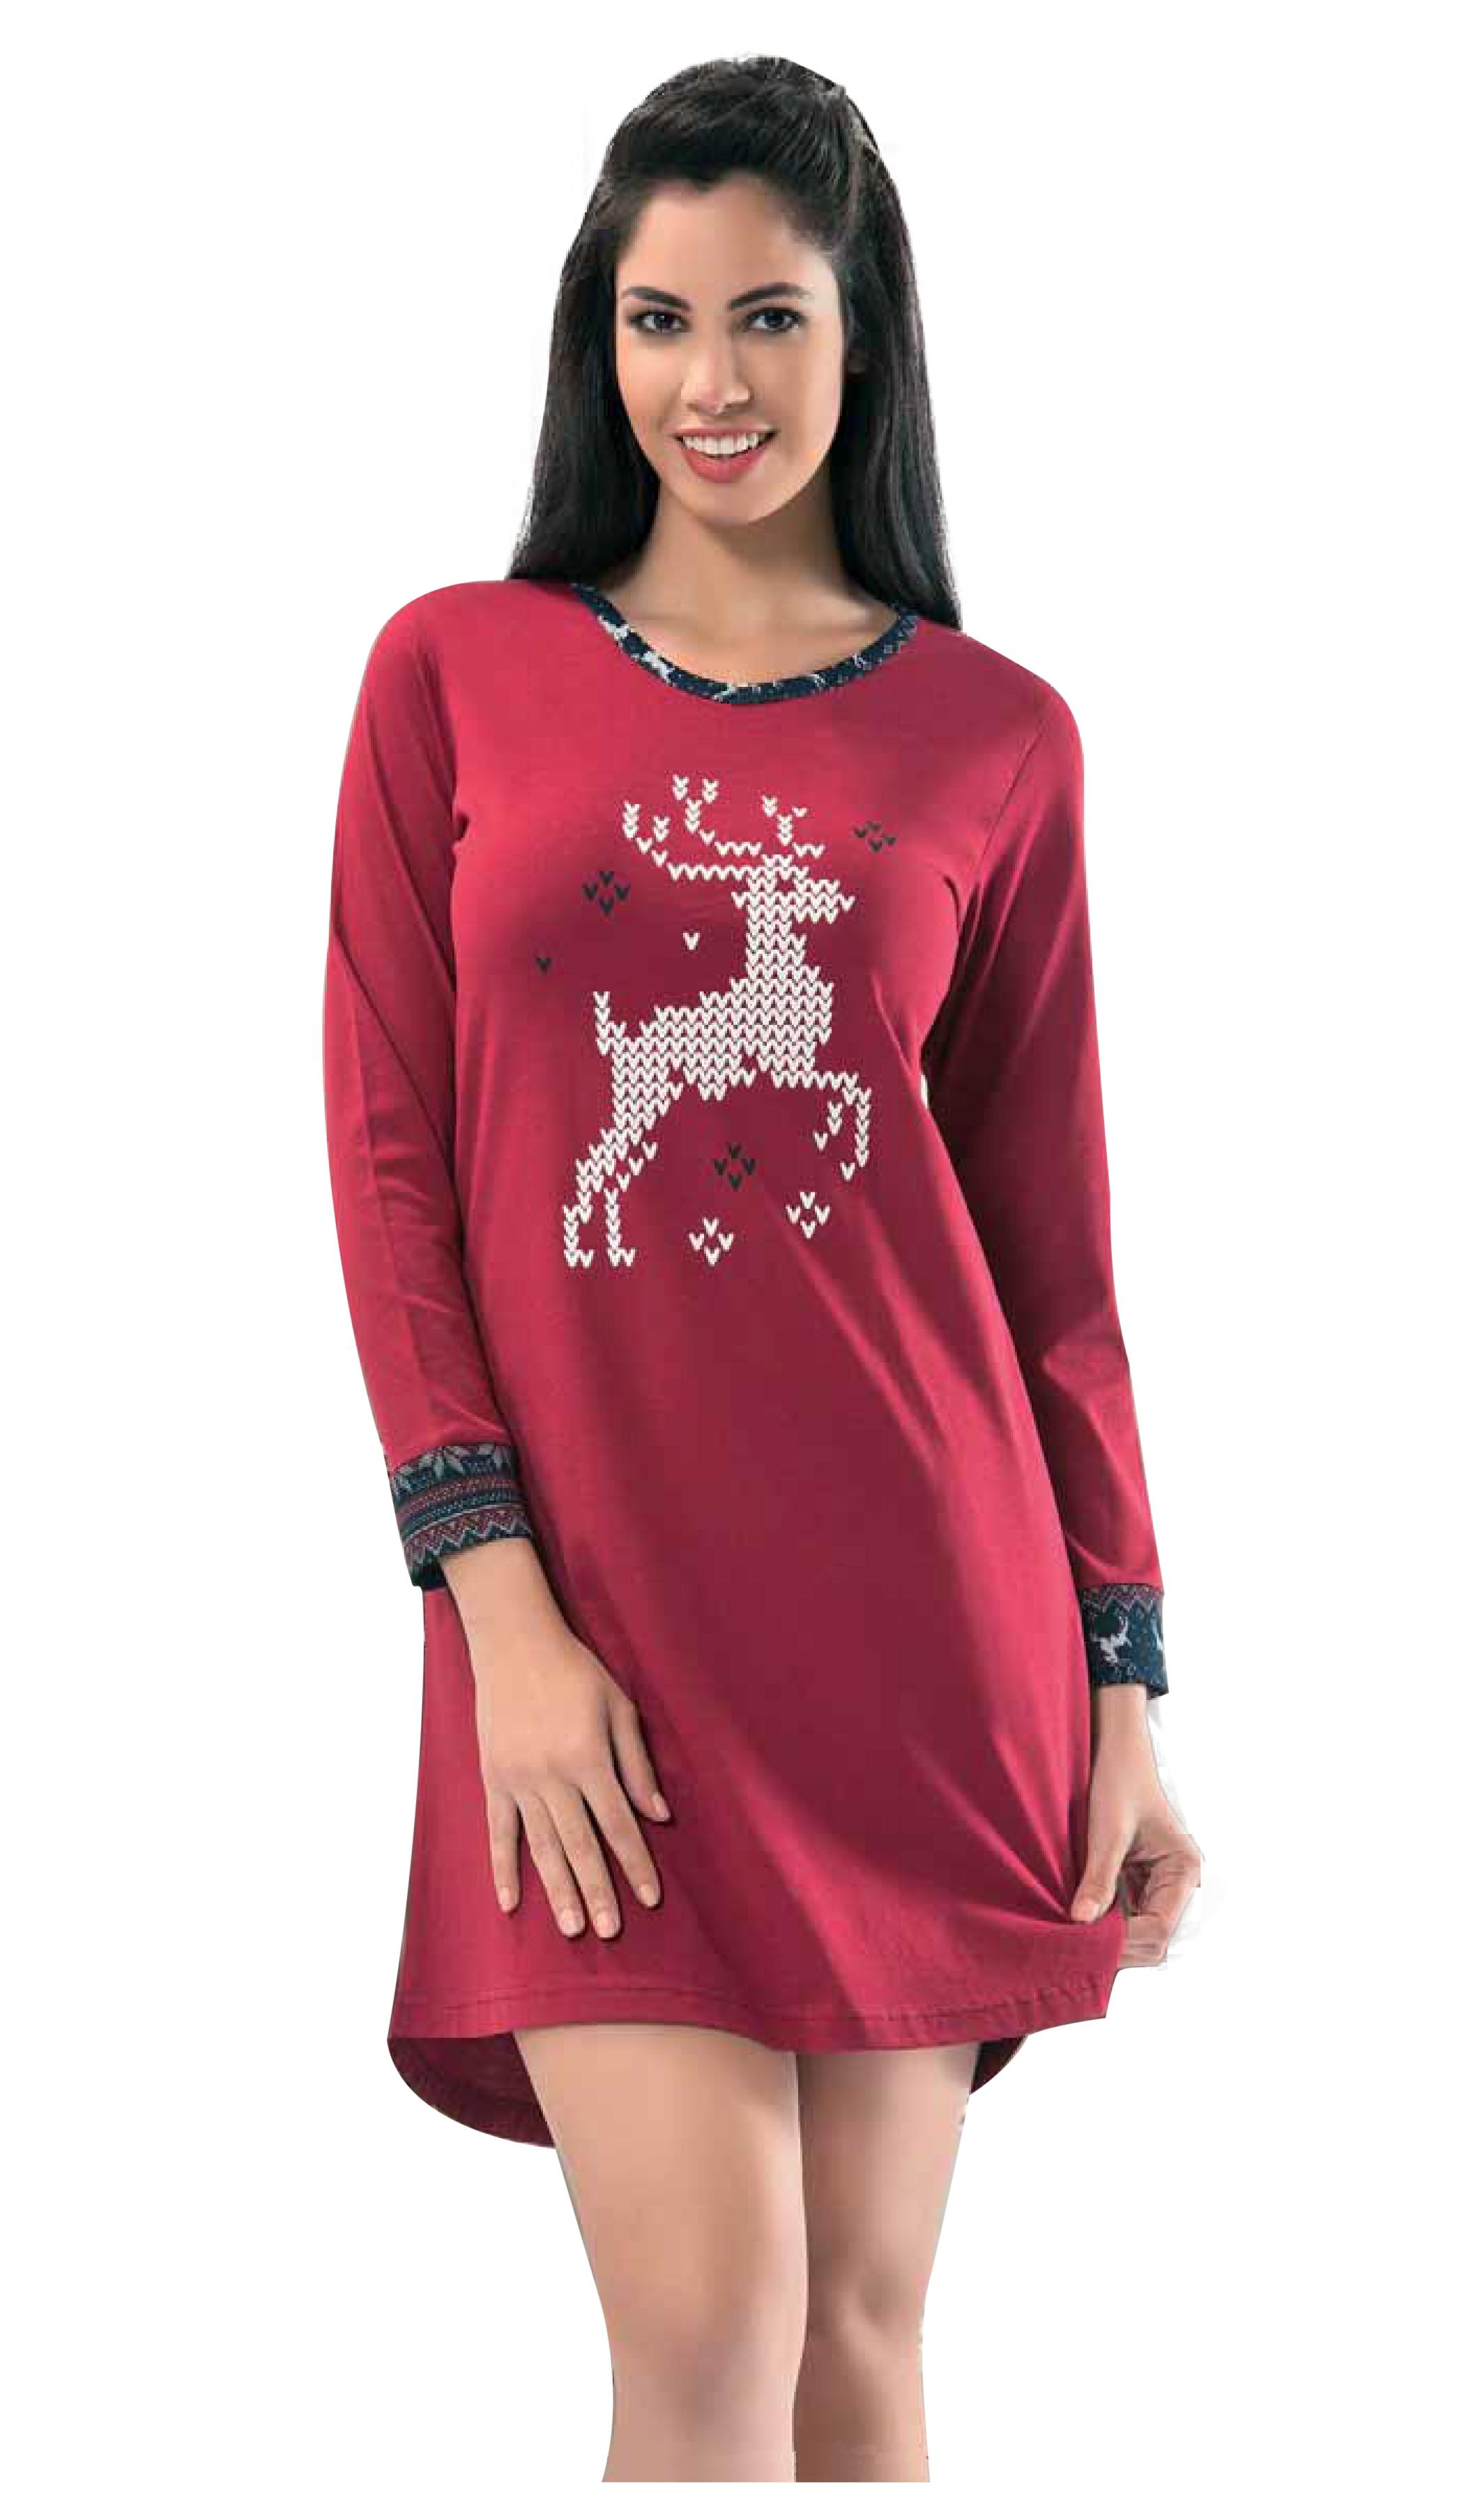 6badb7e1a5 NBB Lingerie Women s Cotton Christmas Adult Holiday Nightgown – NBB ...